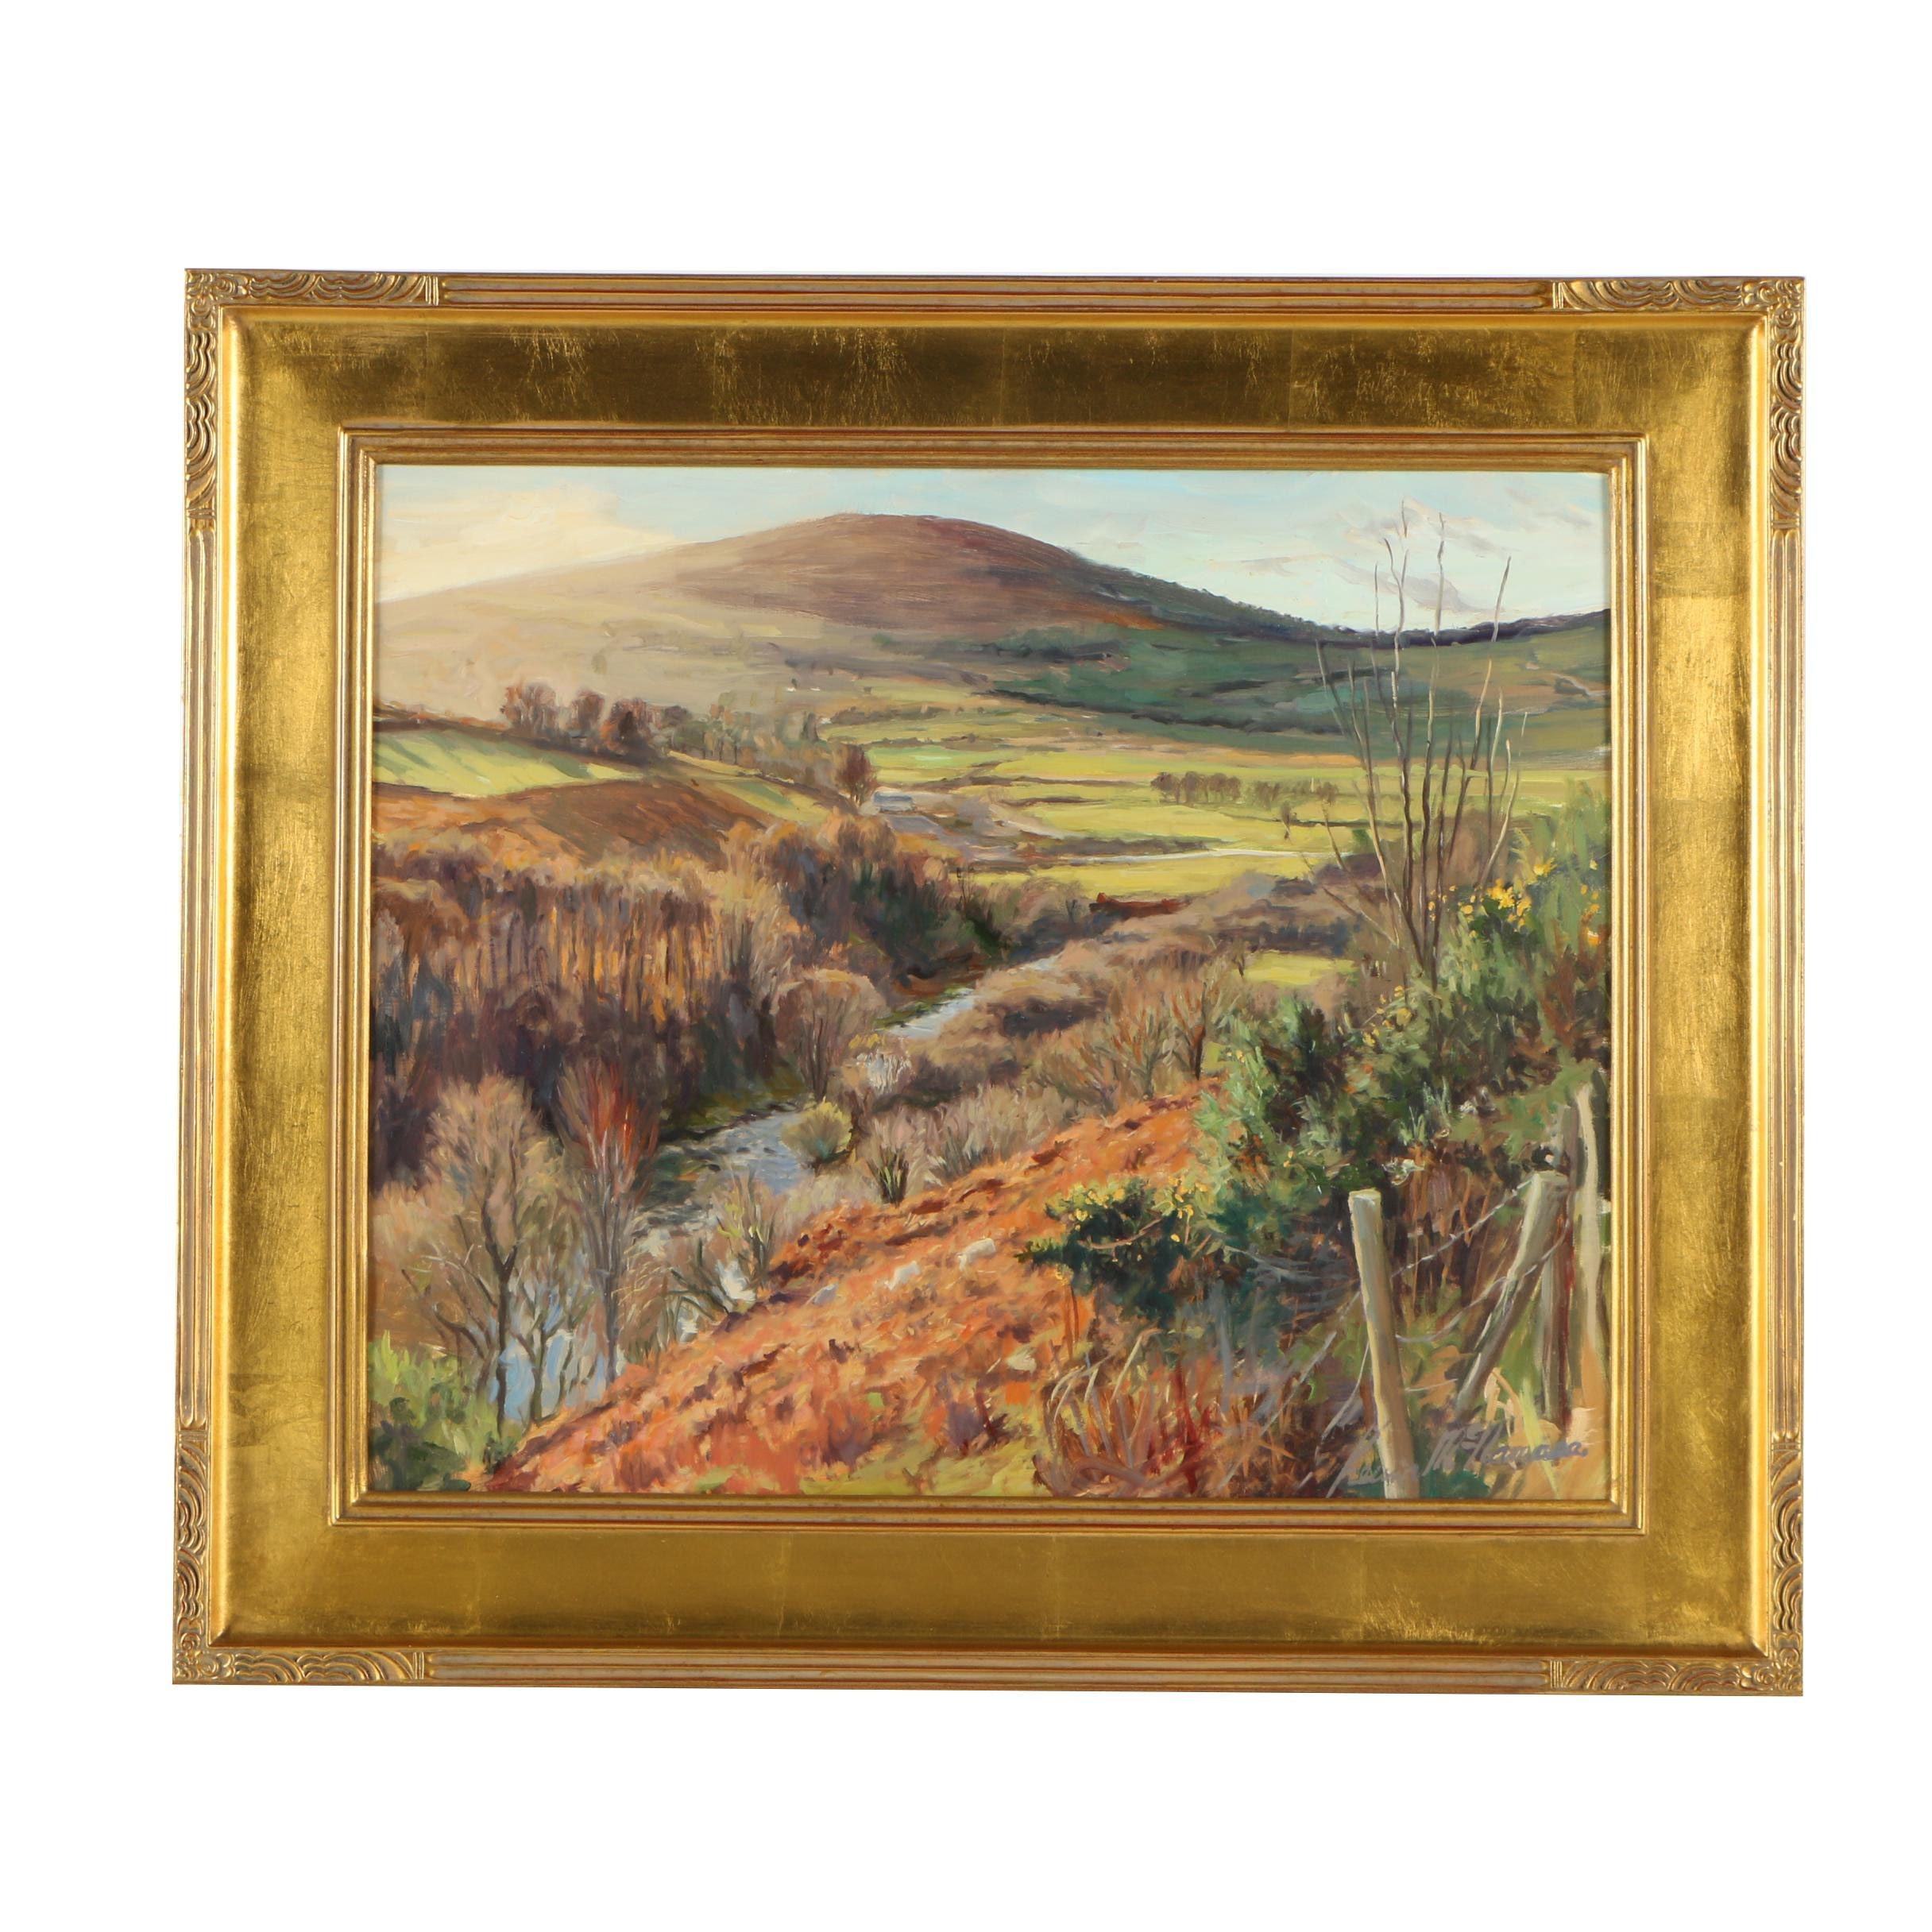 Kevin Noel McNamara Oil Landscape Painting